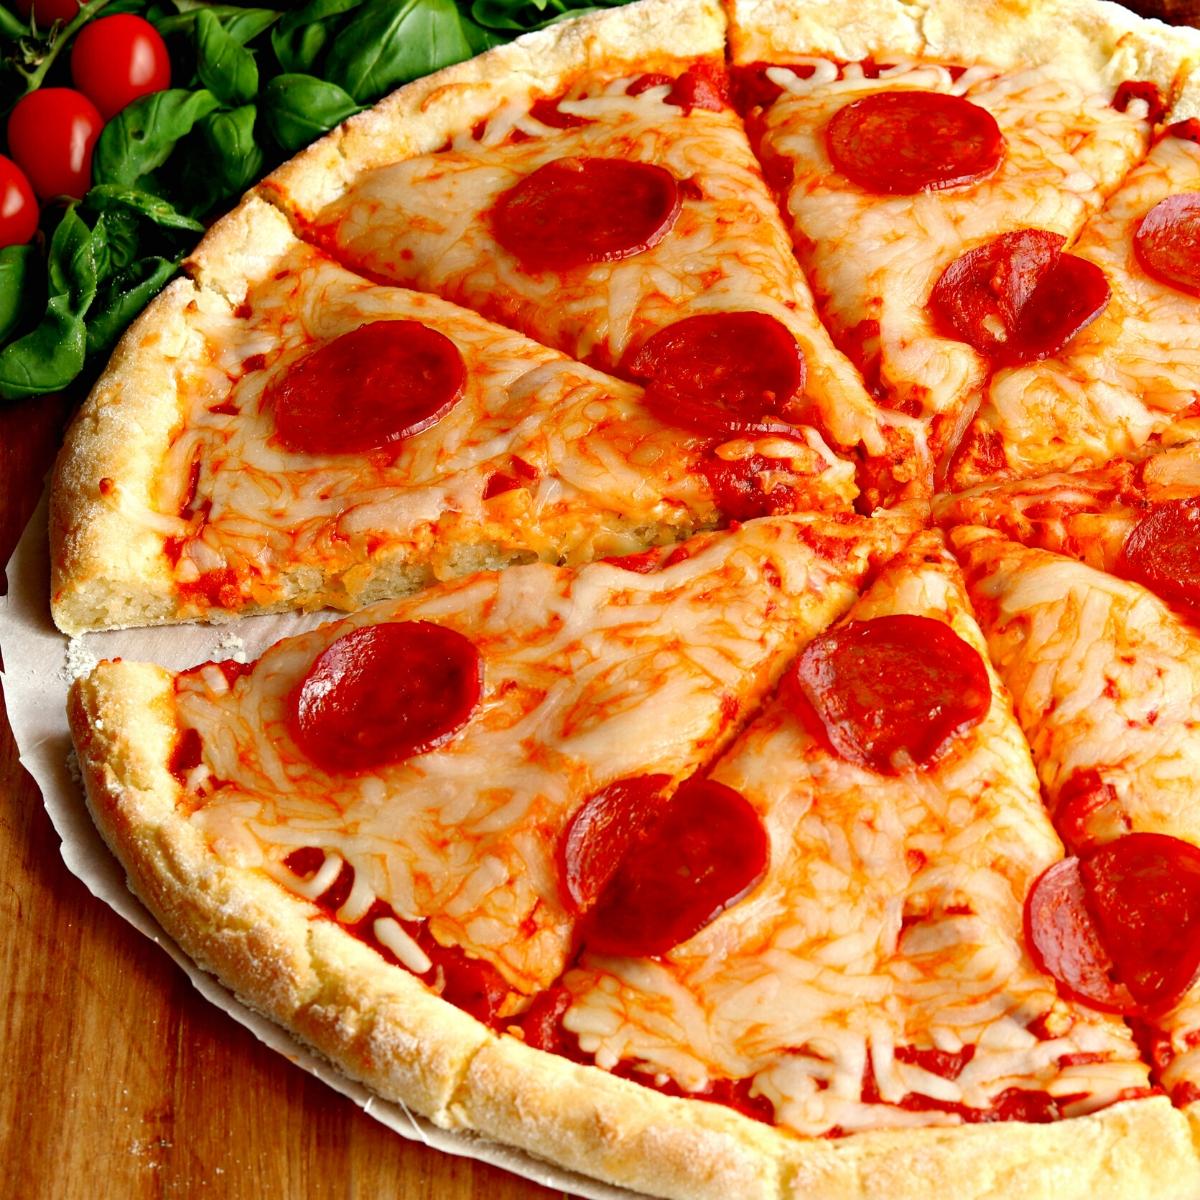 Gluten Free Pizza Dairy Free Vegan Option Mama Knows Gluten Free